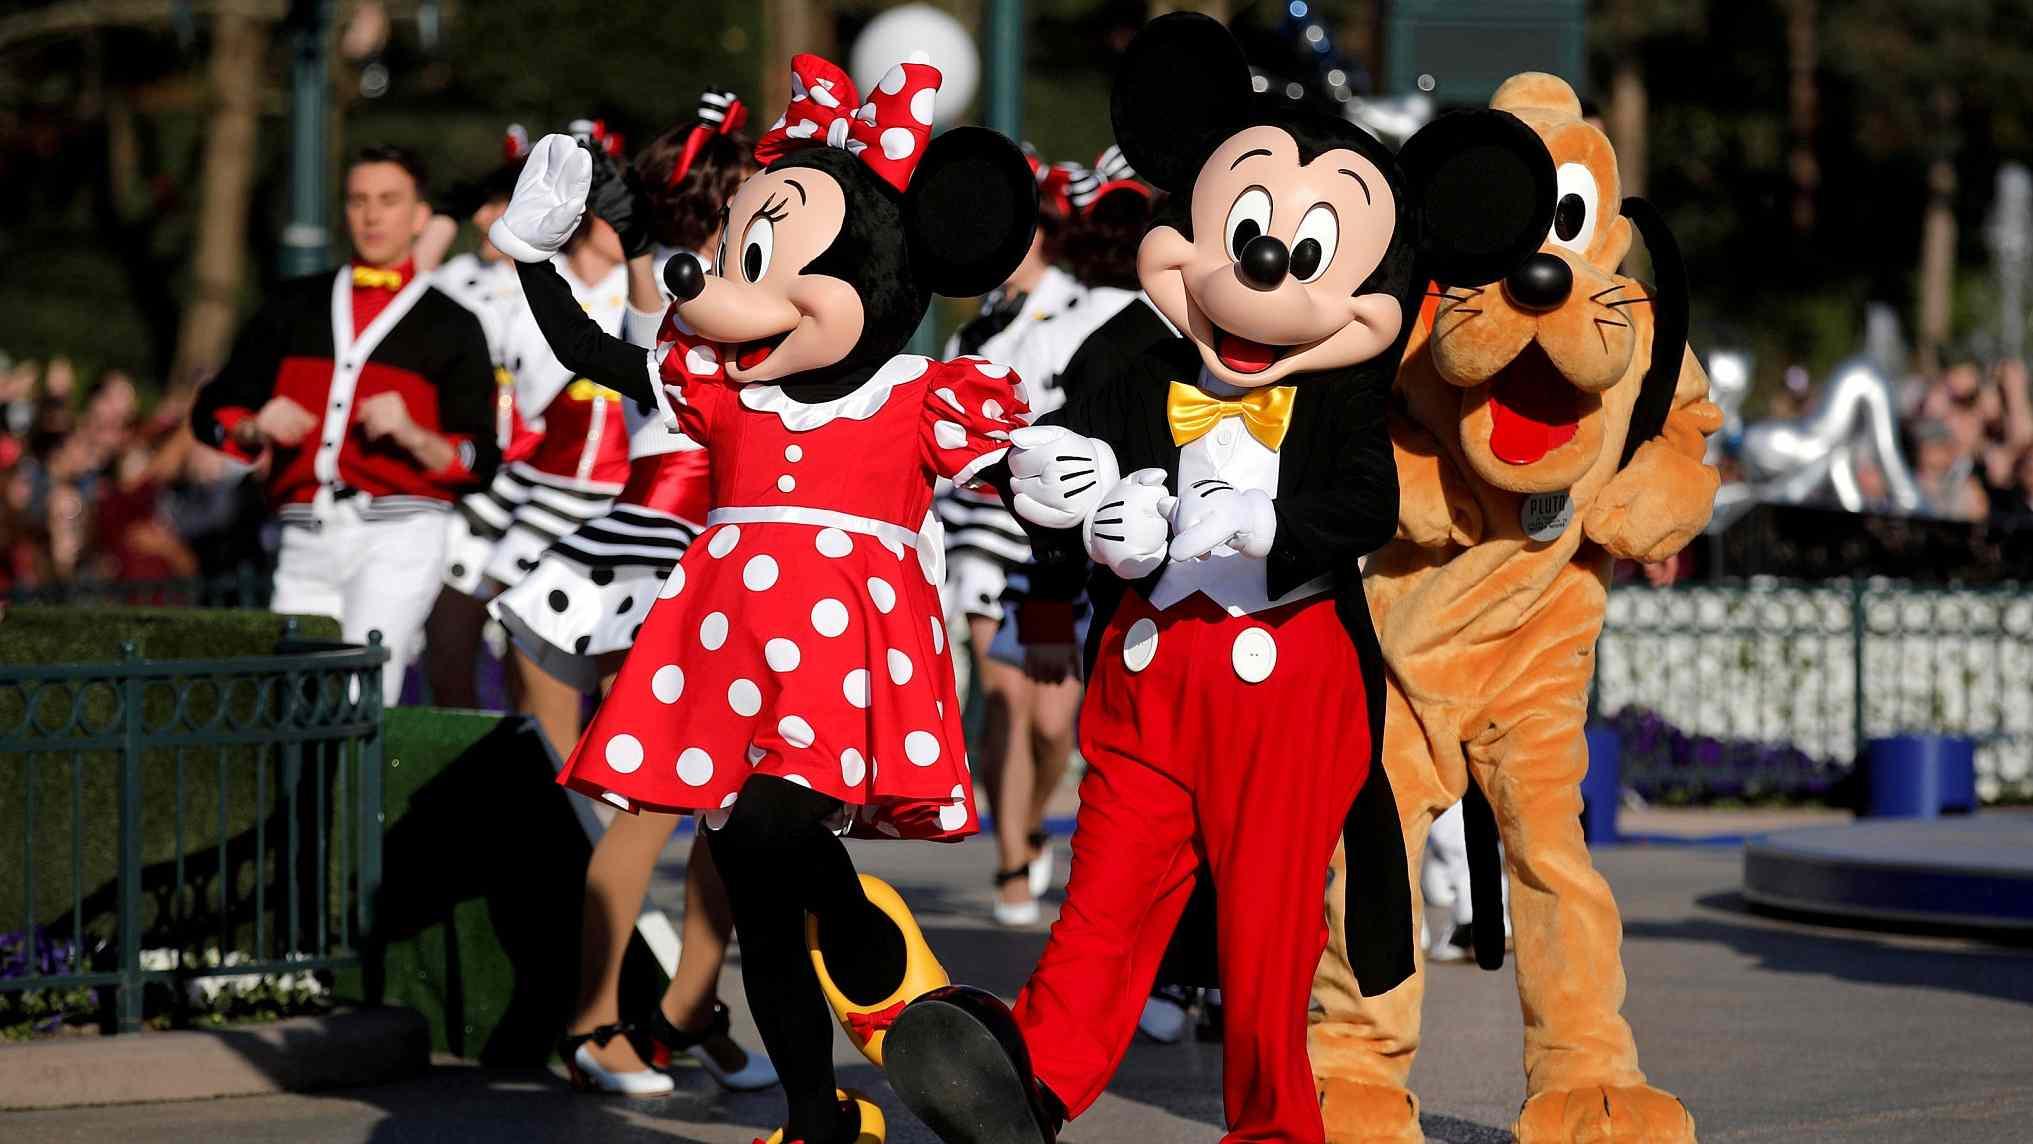 Disney partially reopens Shanghai resort after virus shutdown